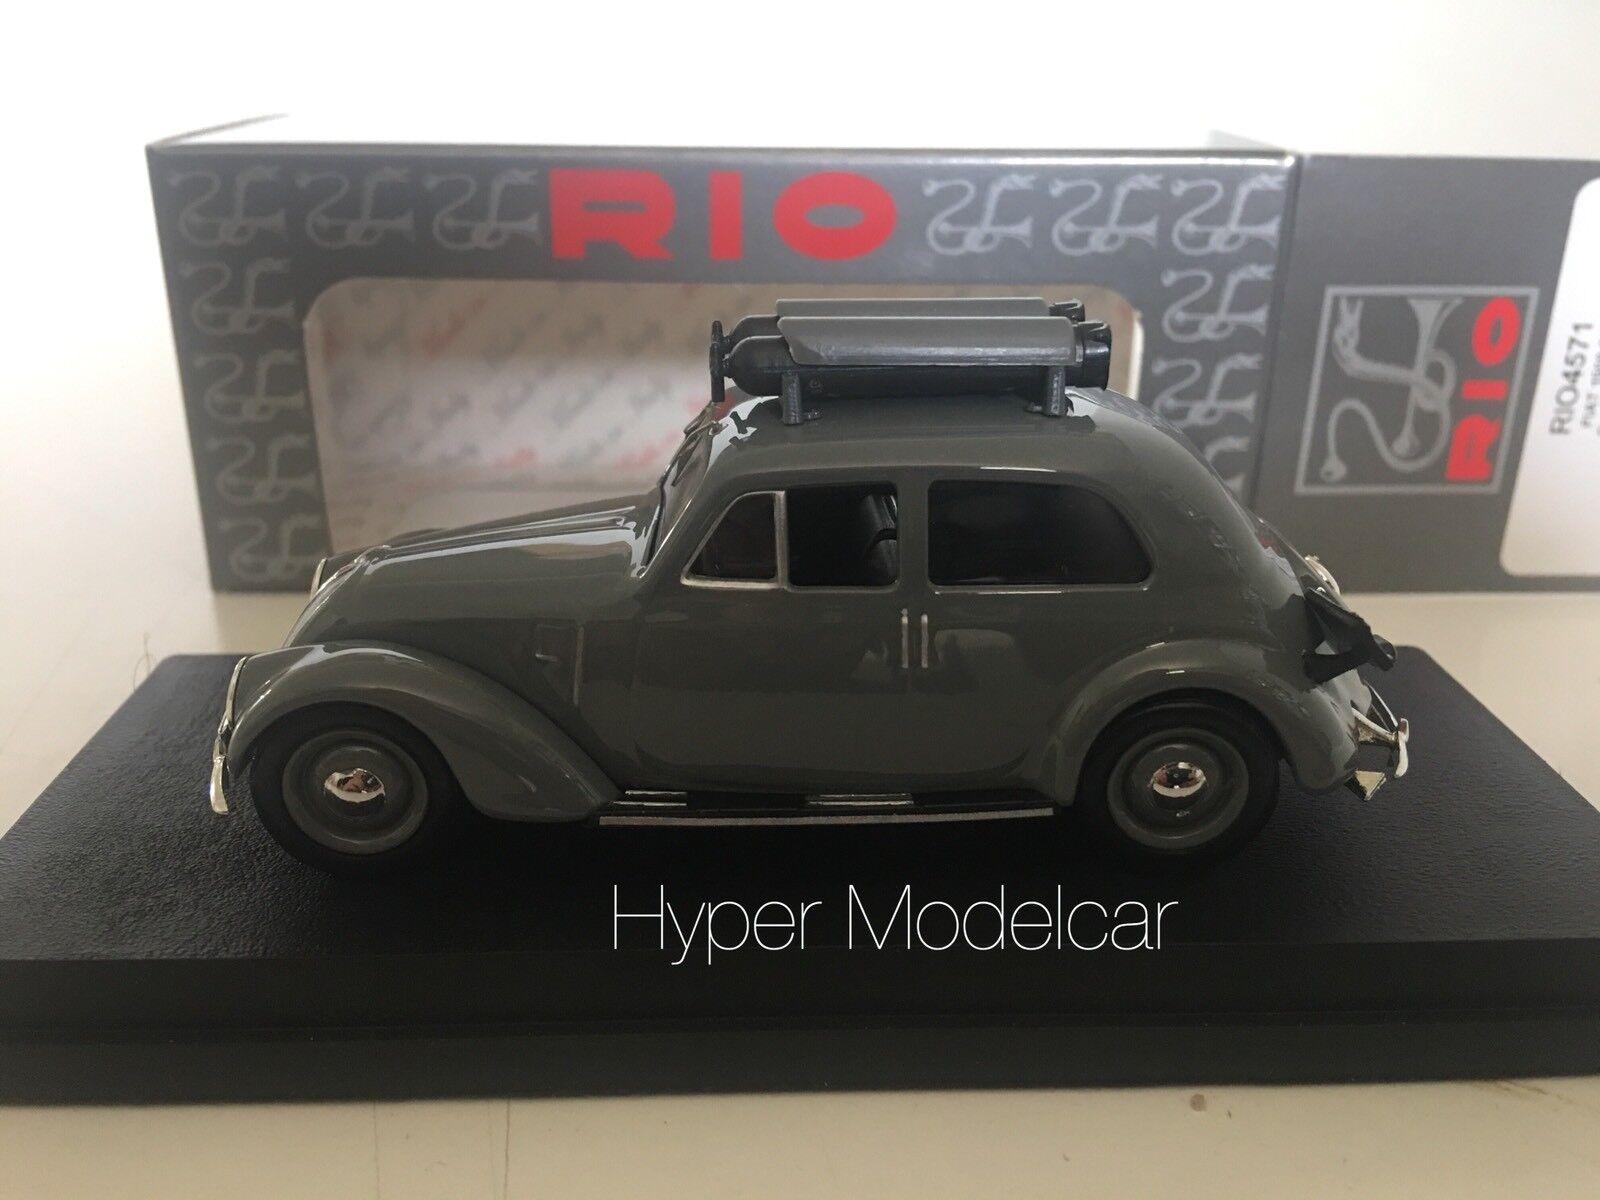 RIO- MODELS 1/43 Fiat 6C 6C 6C 1500 Gasogeno 1935 Grey Art. RIO4571 | Merveilleux  f7742f